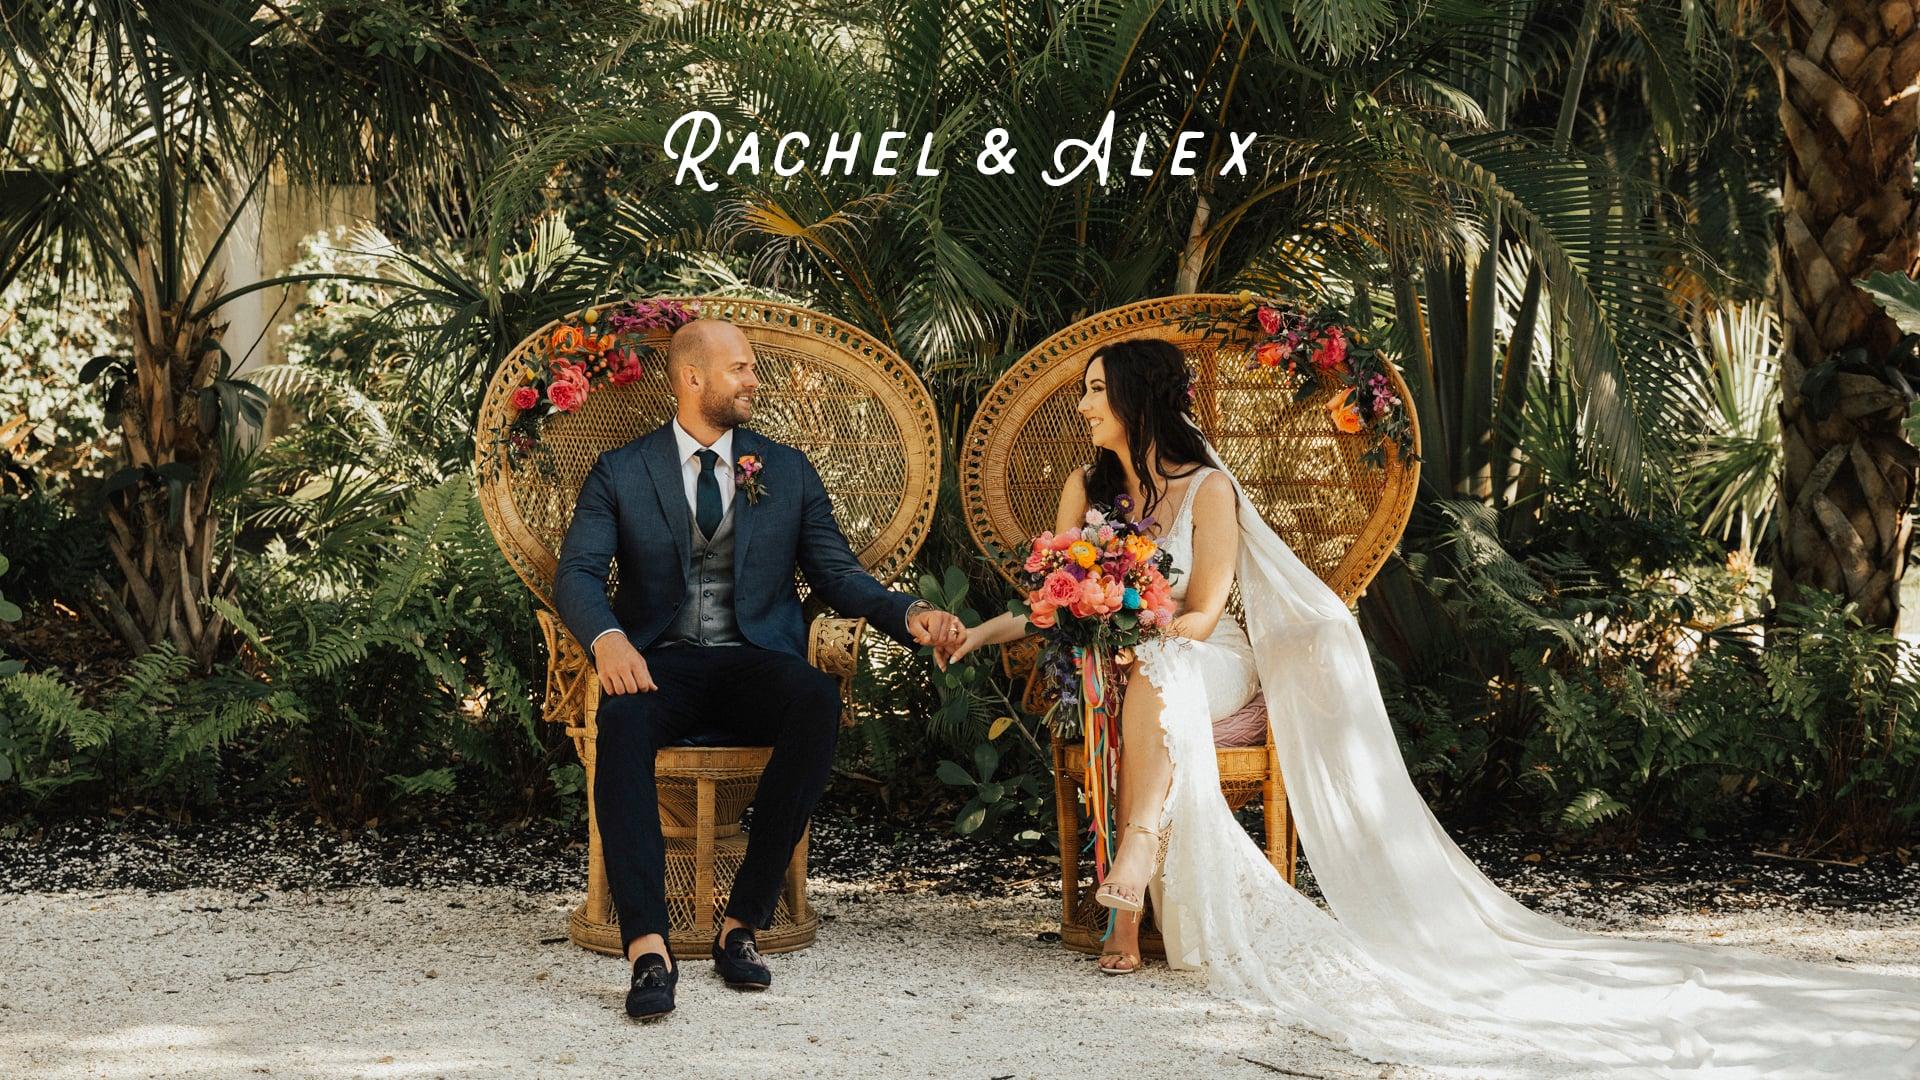 Rachel & Alex   Cottage on the Rock   Florida